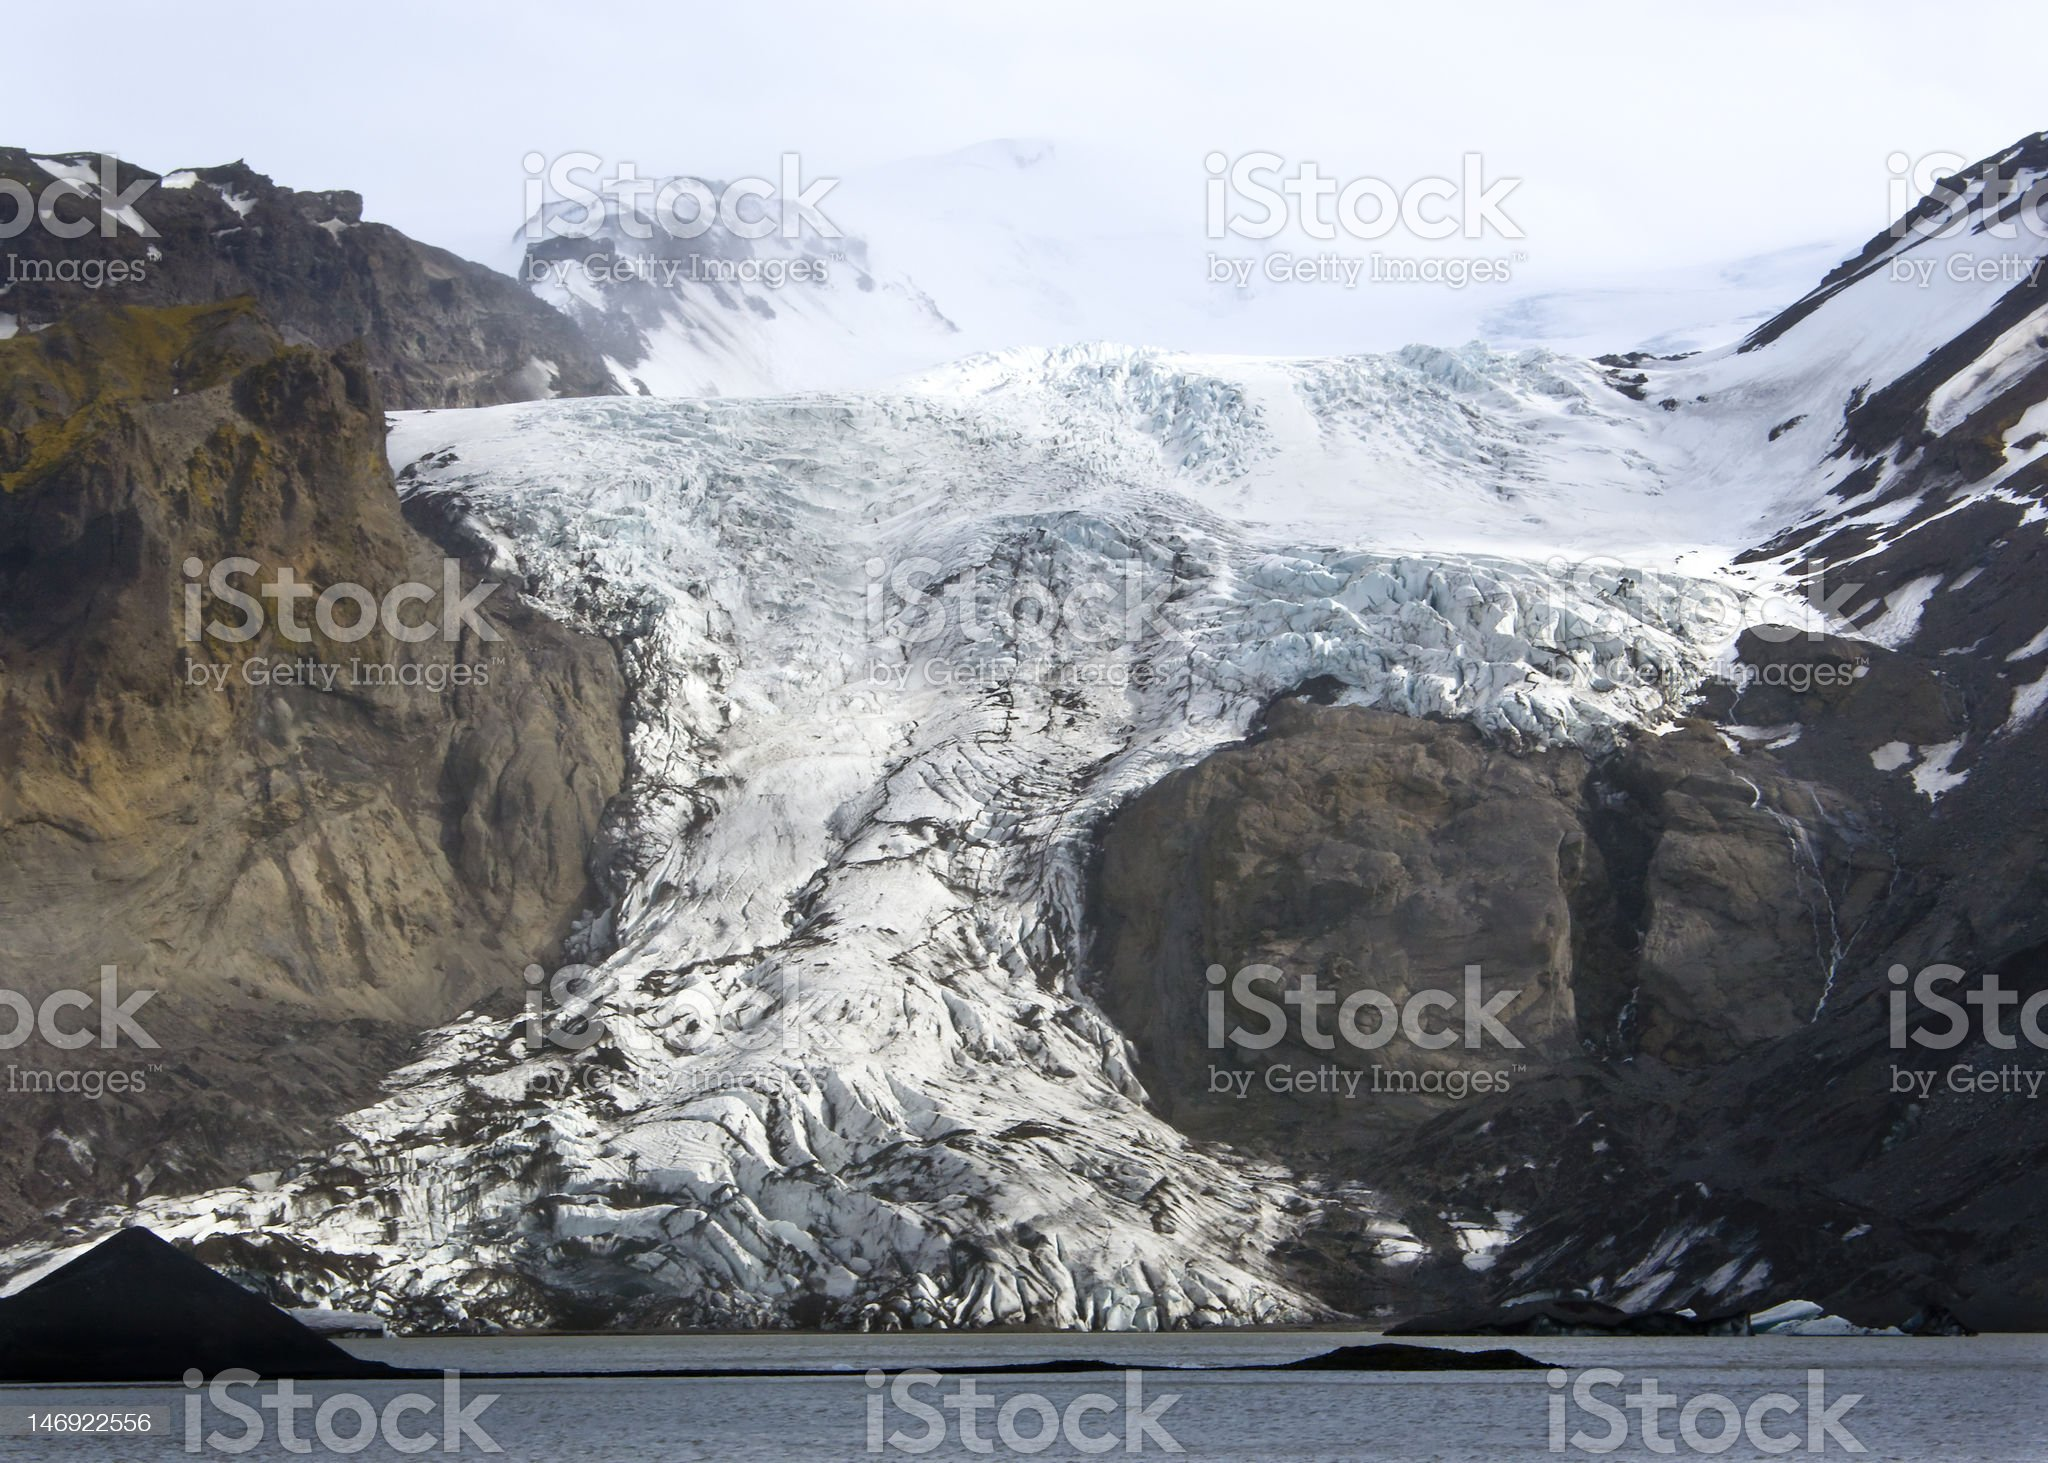 The Eyjafjallajokull glacier Iceland (volcano activity) royalty-free stock vector art